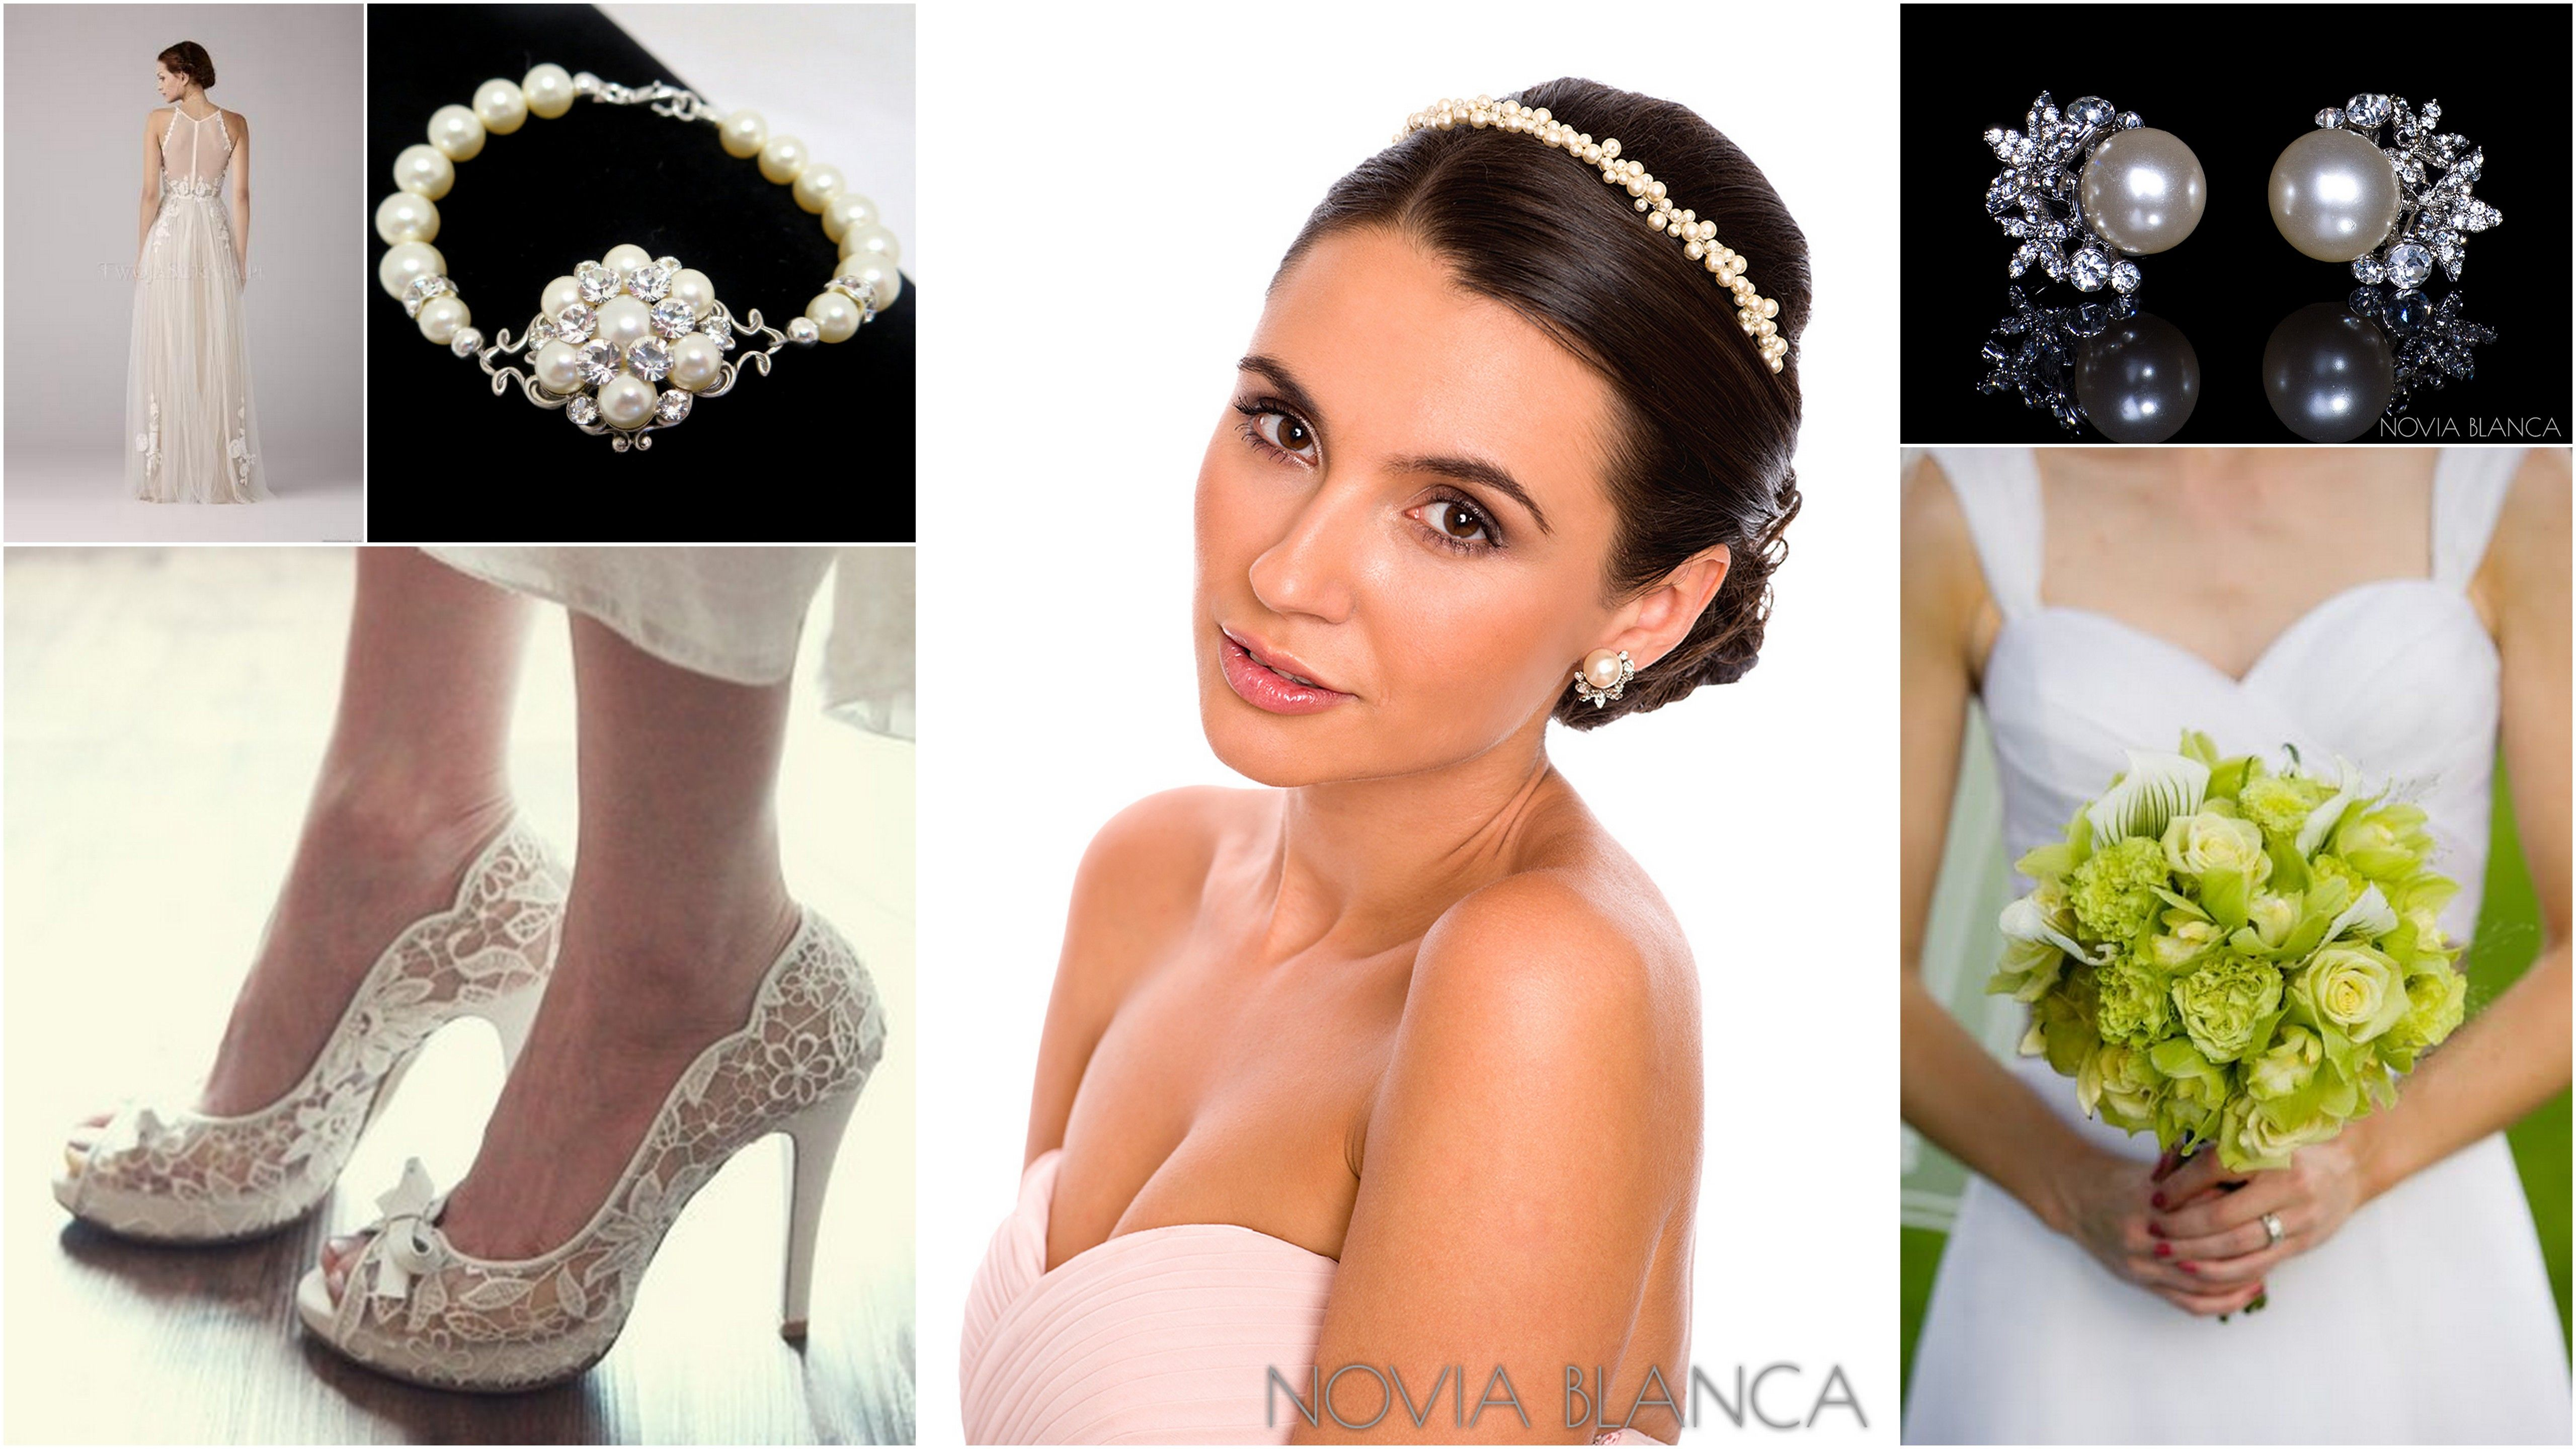 Pin On Bridal Look Inspiration Stylizacje Slubne